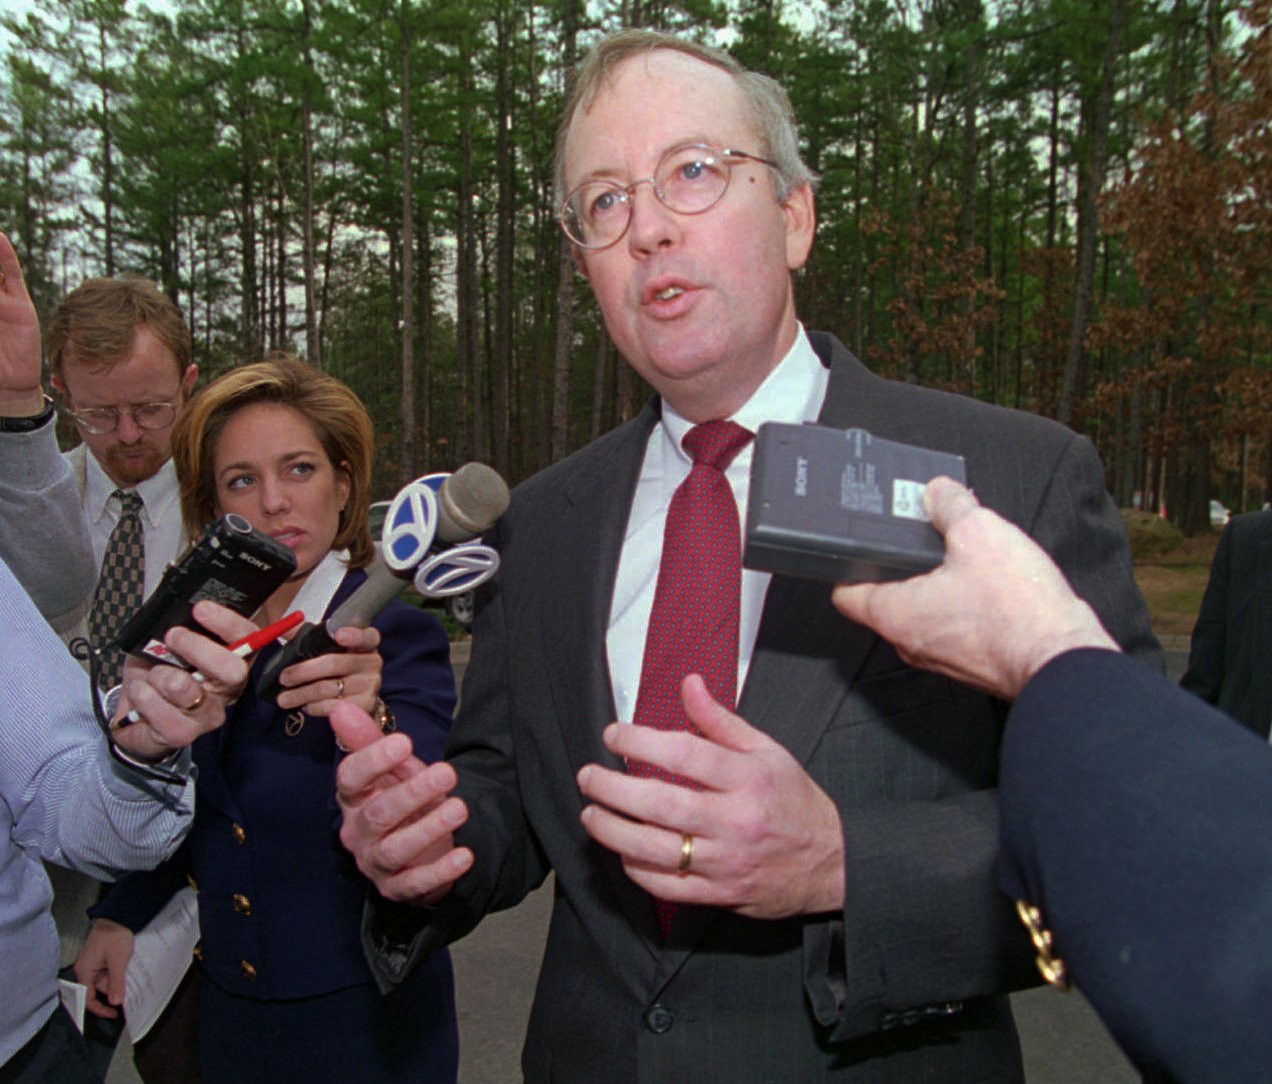 Daily Mail: Αυτό ήταν το τέλος της δυναστείας των Κλίντον – Όλα τα σκάνδαλα μιας «βρώμικης» οικογένειας - Εικόνα4